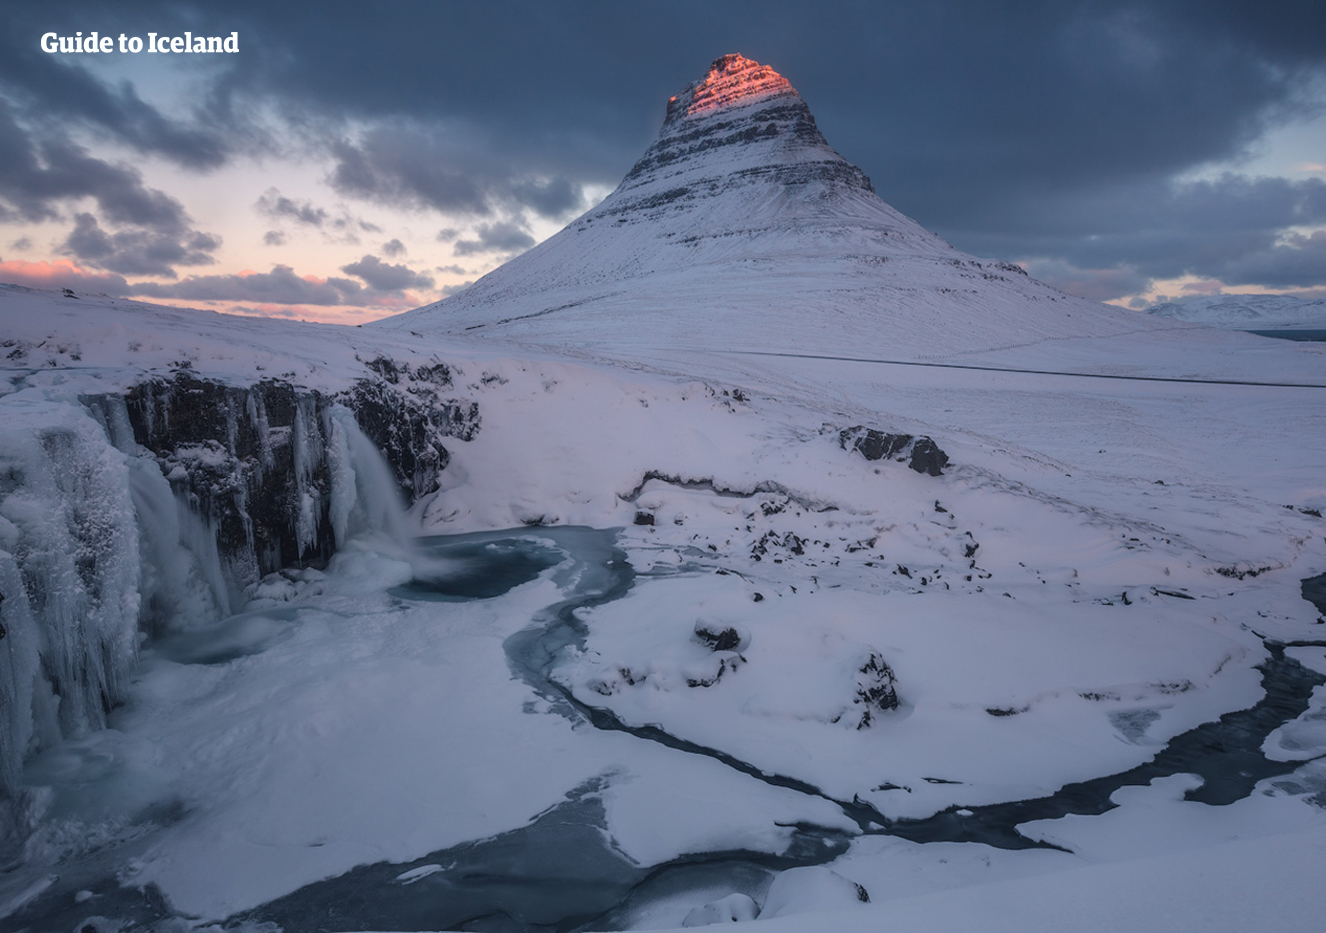 La hermosa iglesia negra de Búðir en la península de Snæfellsnes bajo la aurora boreal.